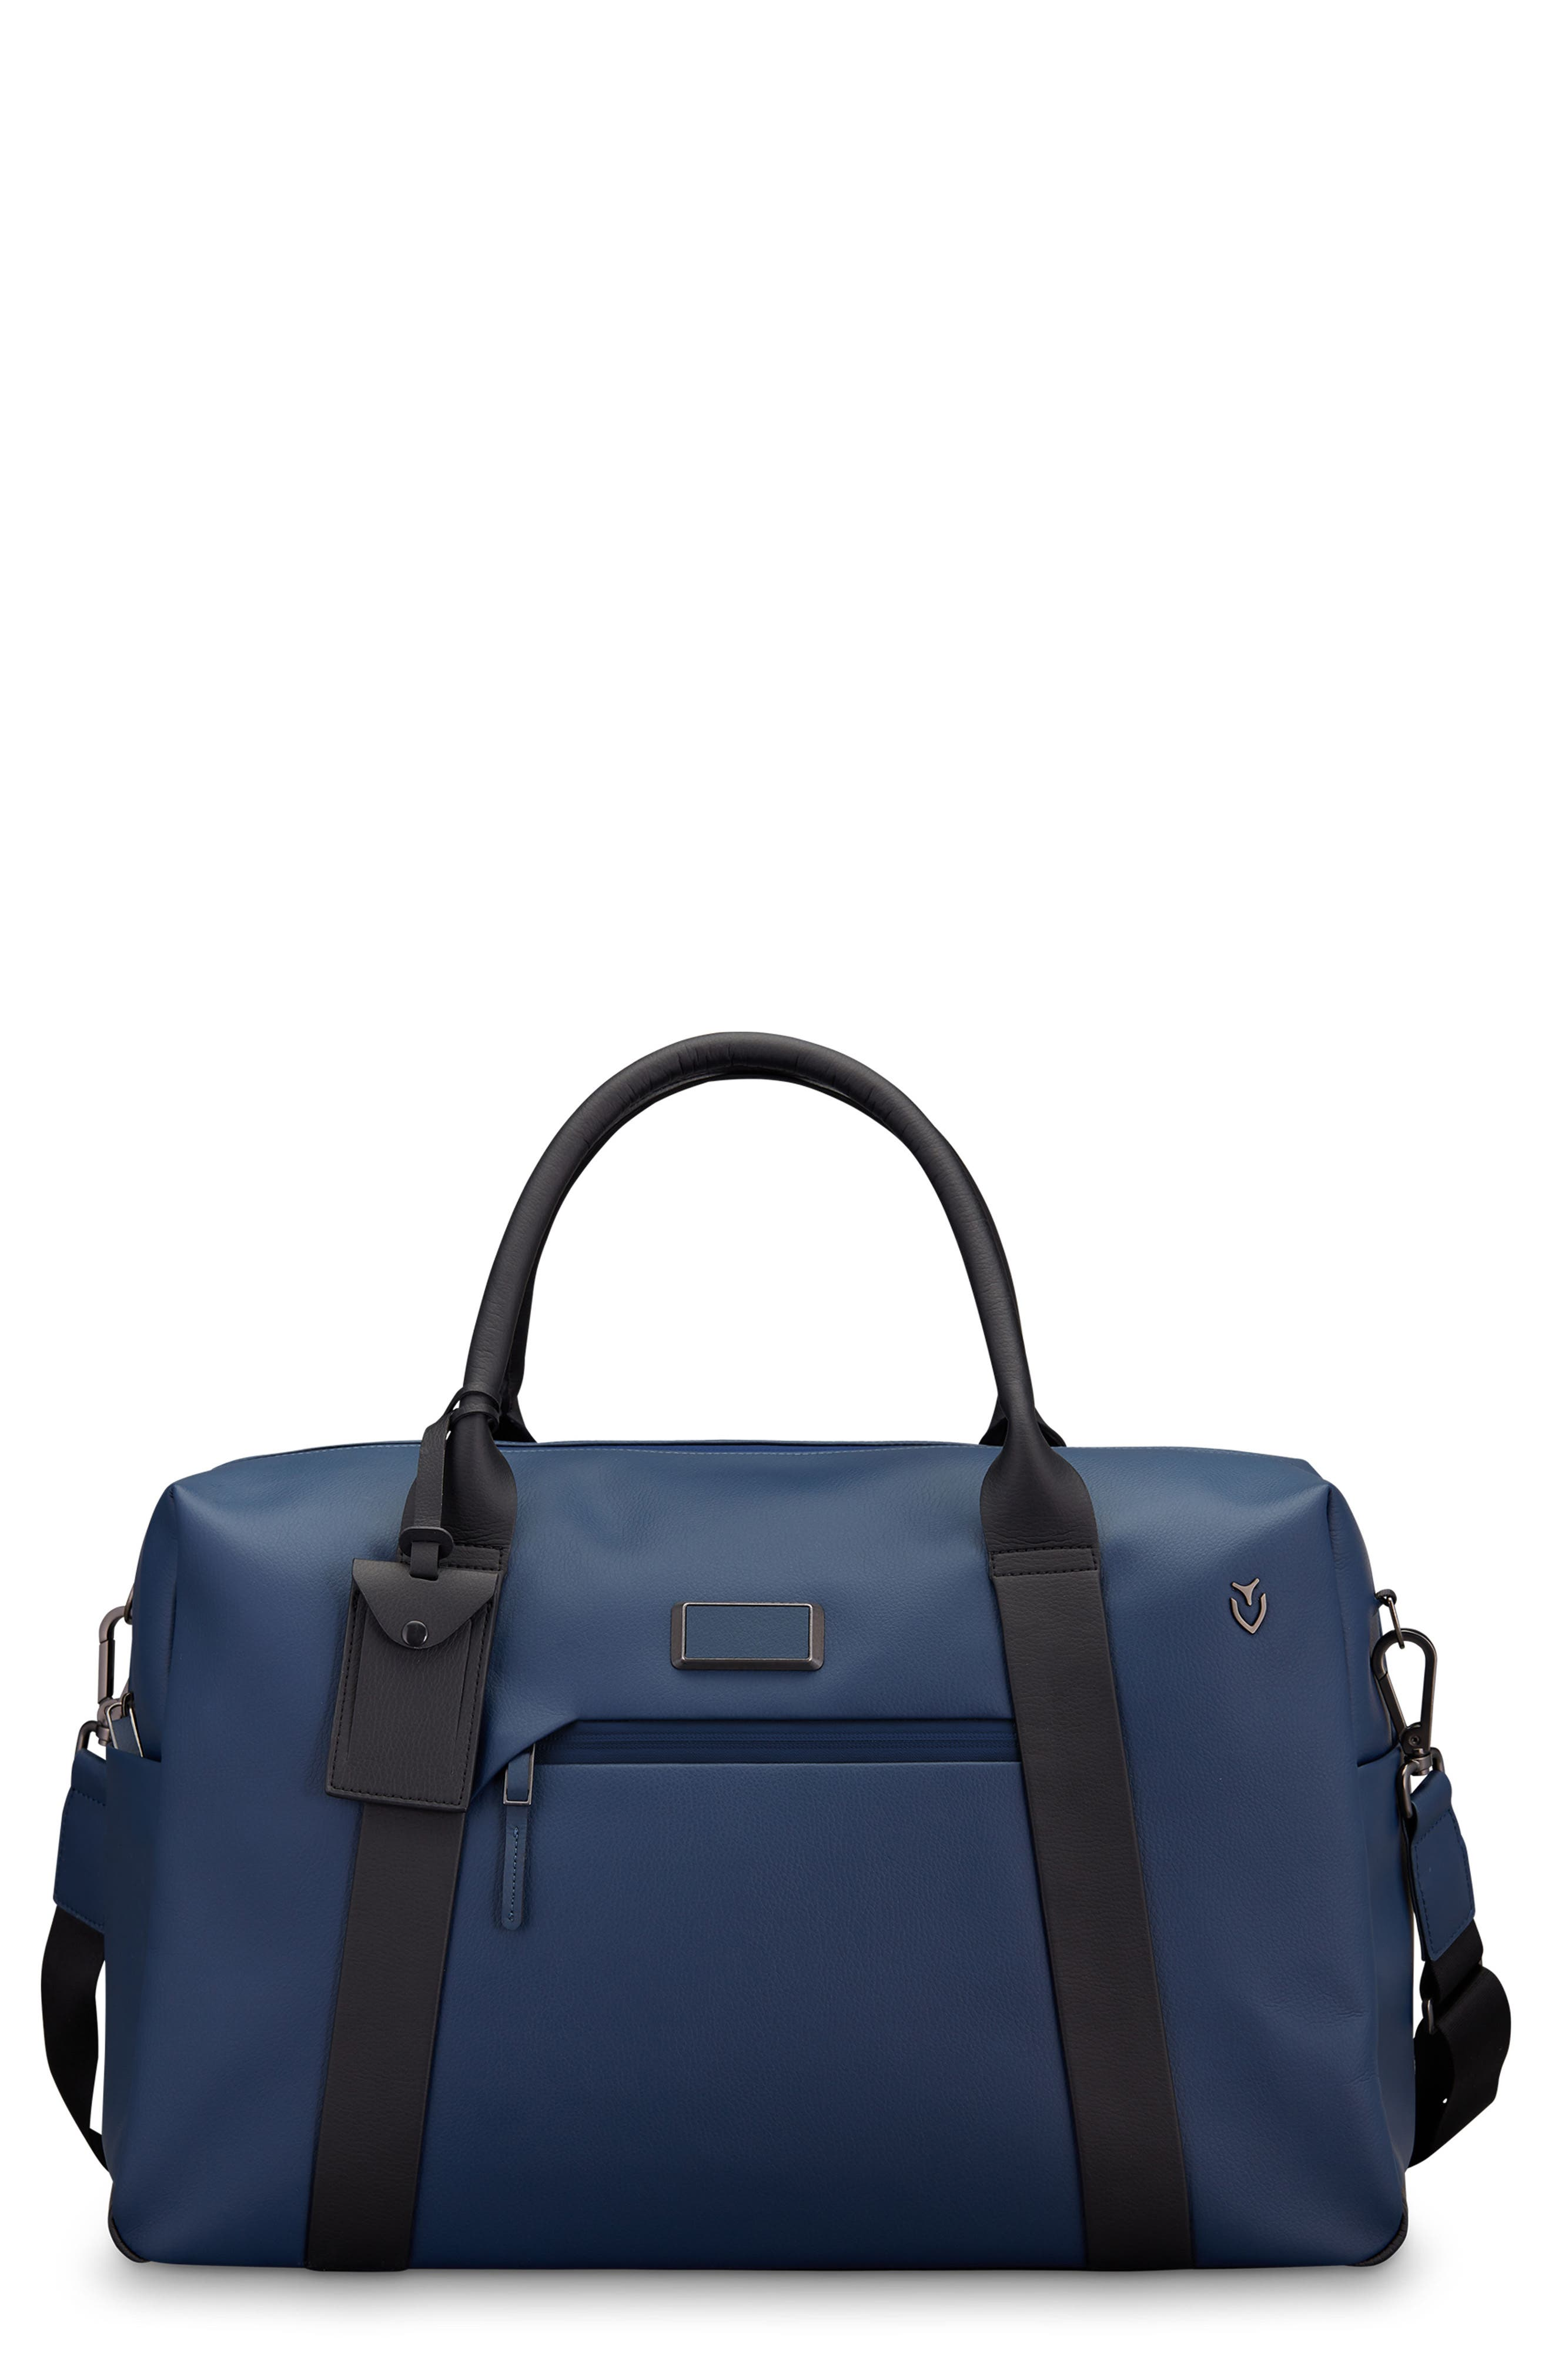 Signature 2.0 Faux Leather Duffel Bag,                             Main thumbnail 1, color,                             PEBBLED NAVY/ BLACK